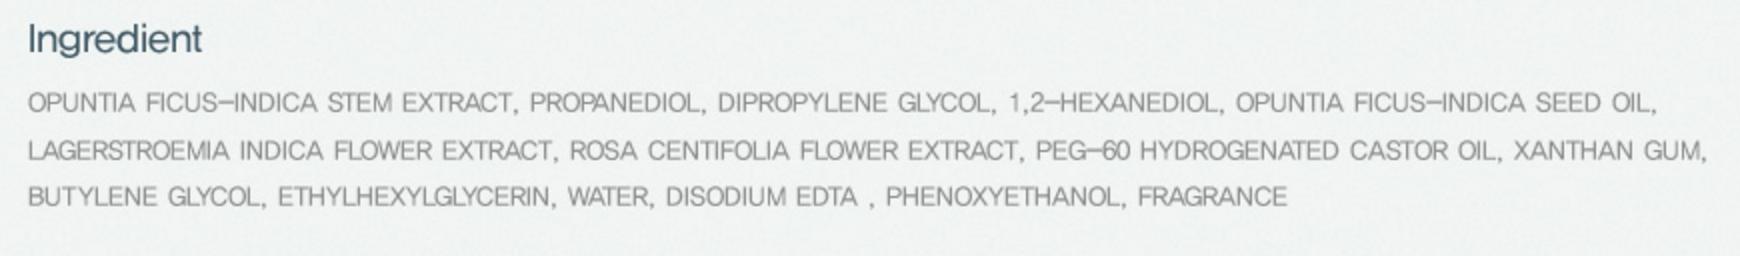 Ingredients list for the Huxley Toner taken from http://www.huxley.co.kr/